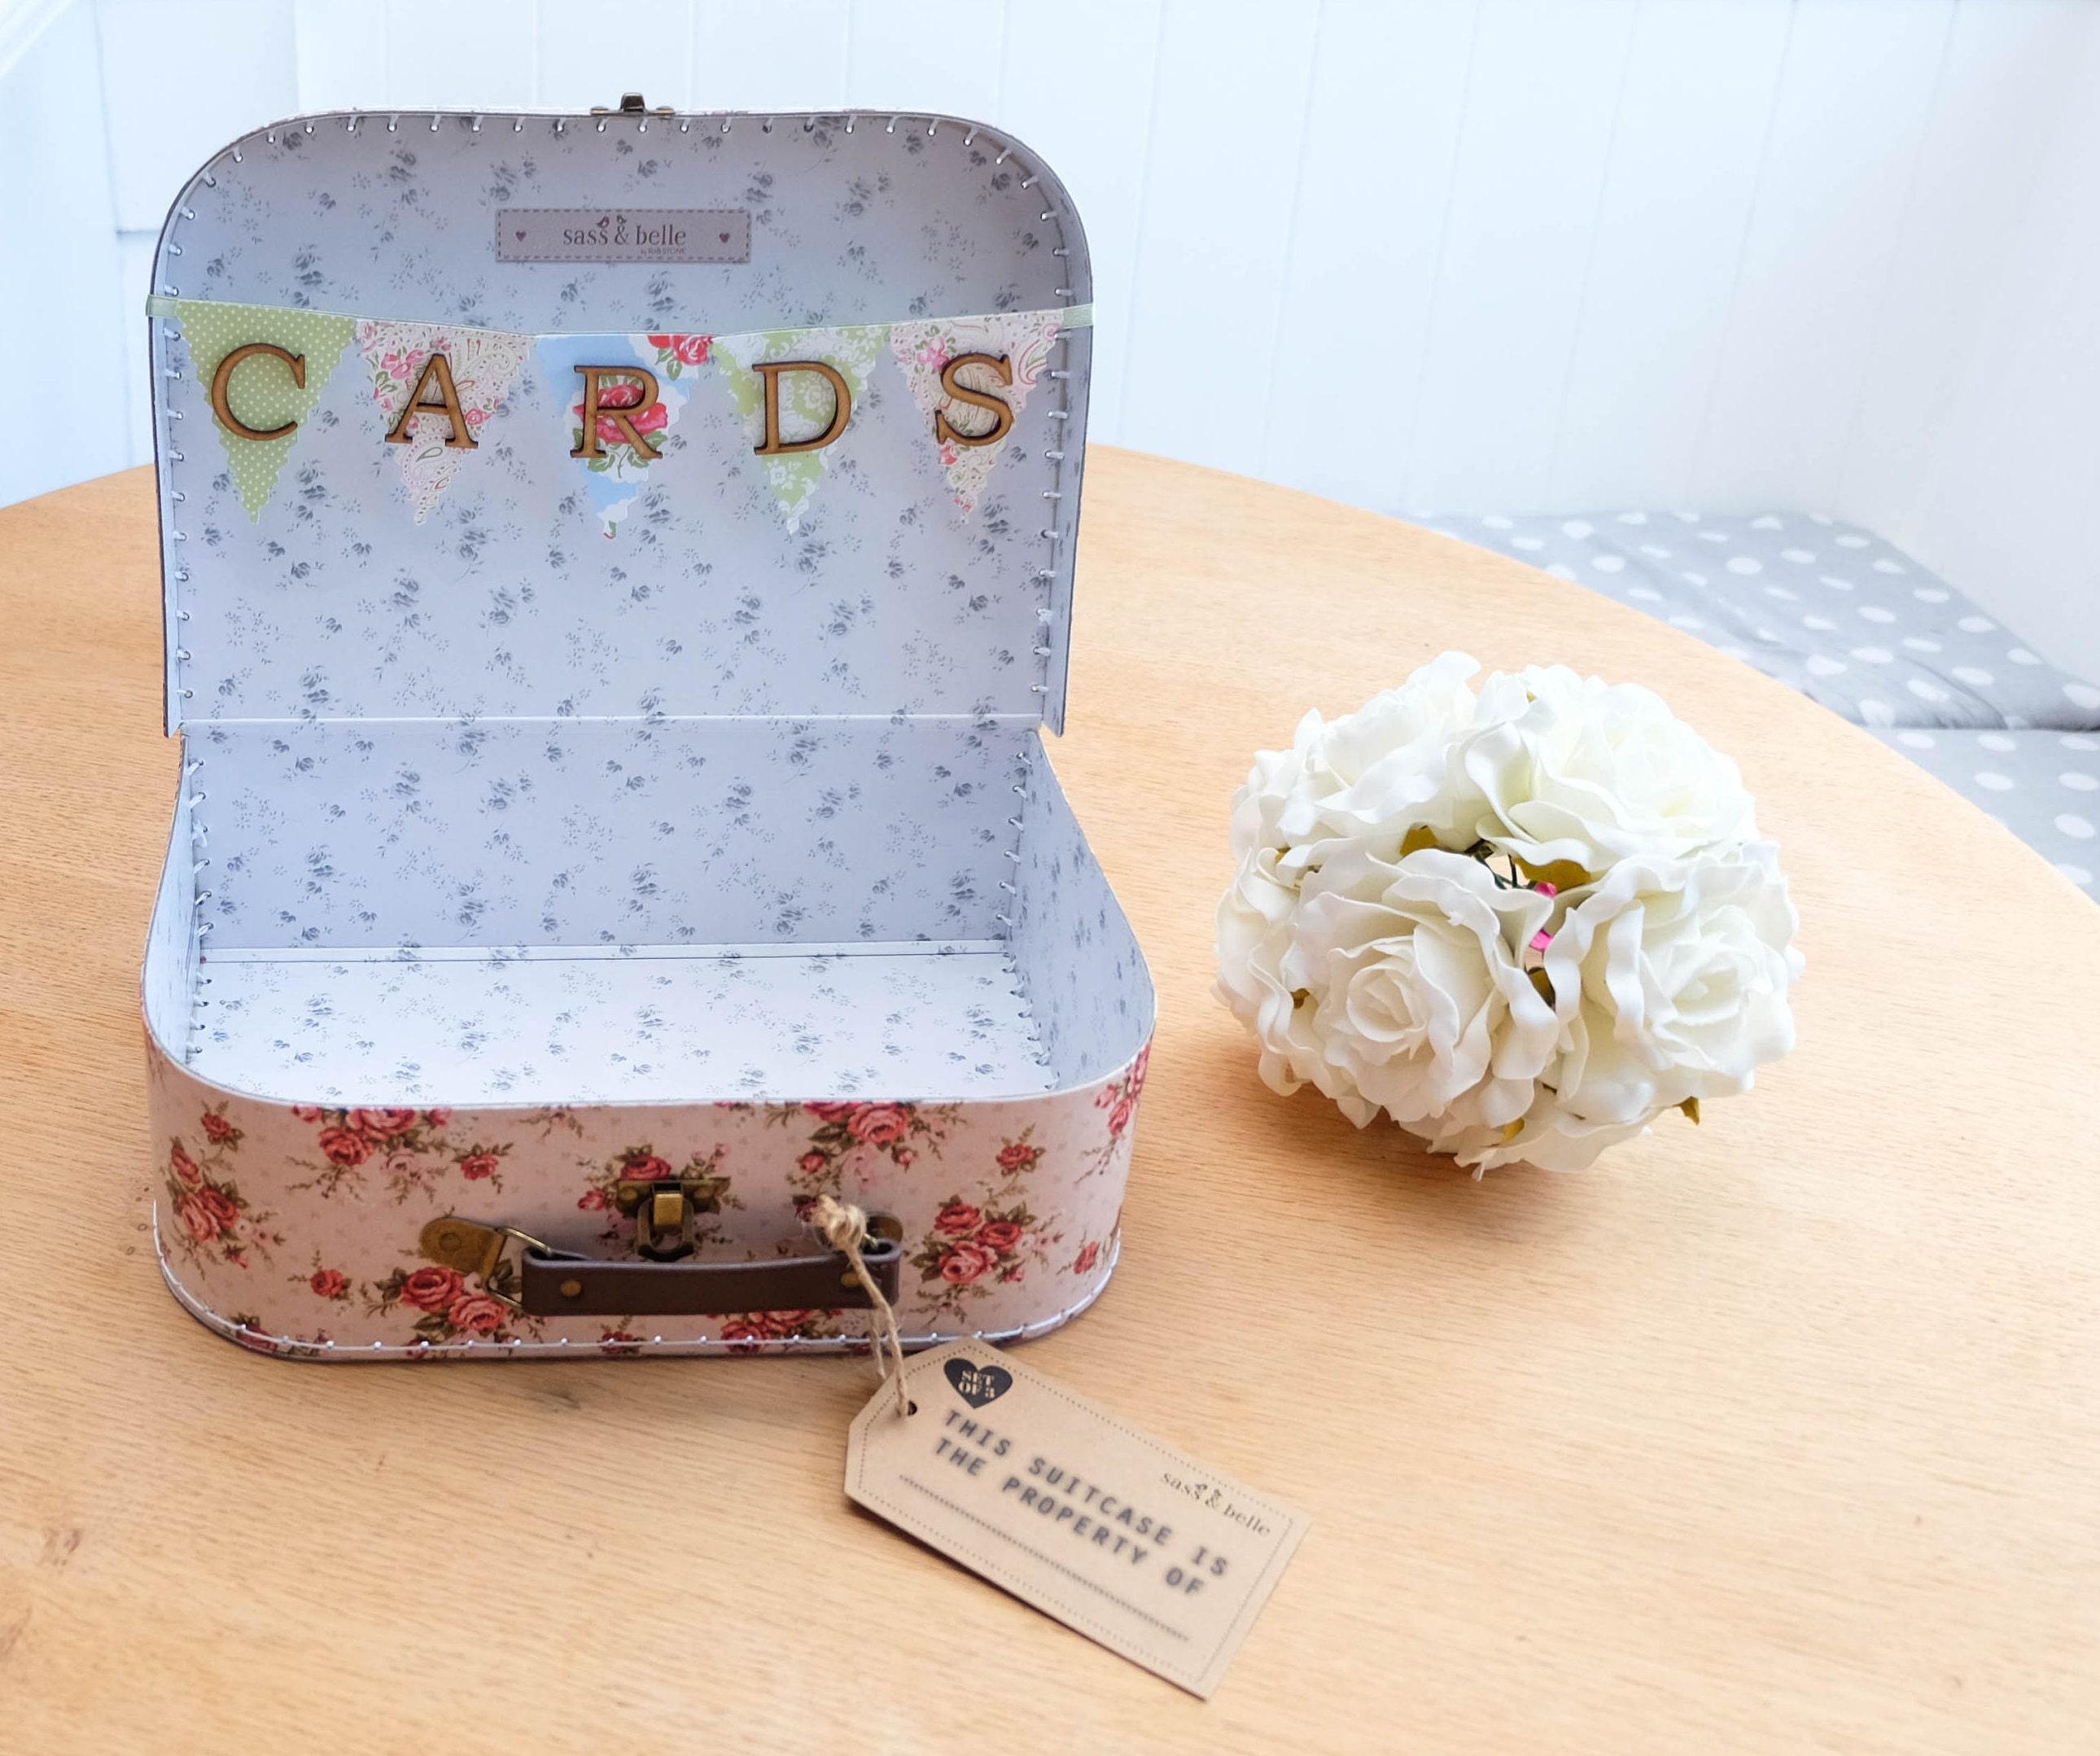 cartes de sass belle shabby chic floral de mariage. Black Bedroom Furniture Sets. Home Design Ideas